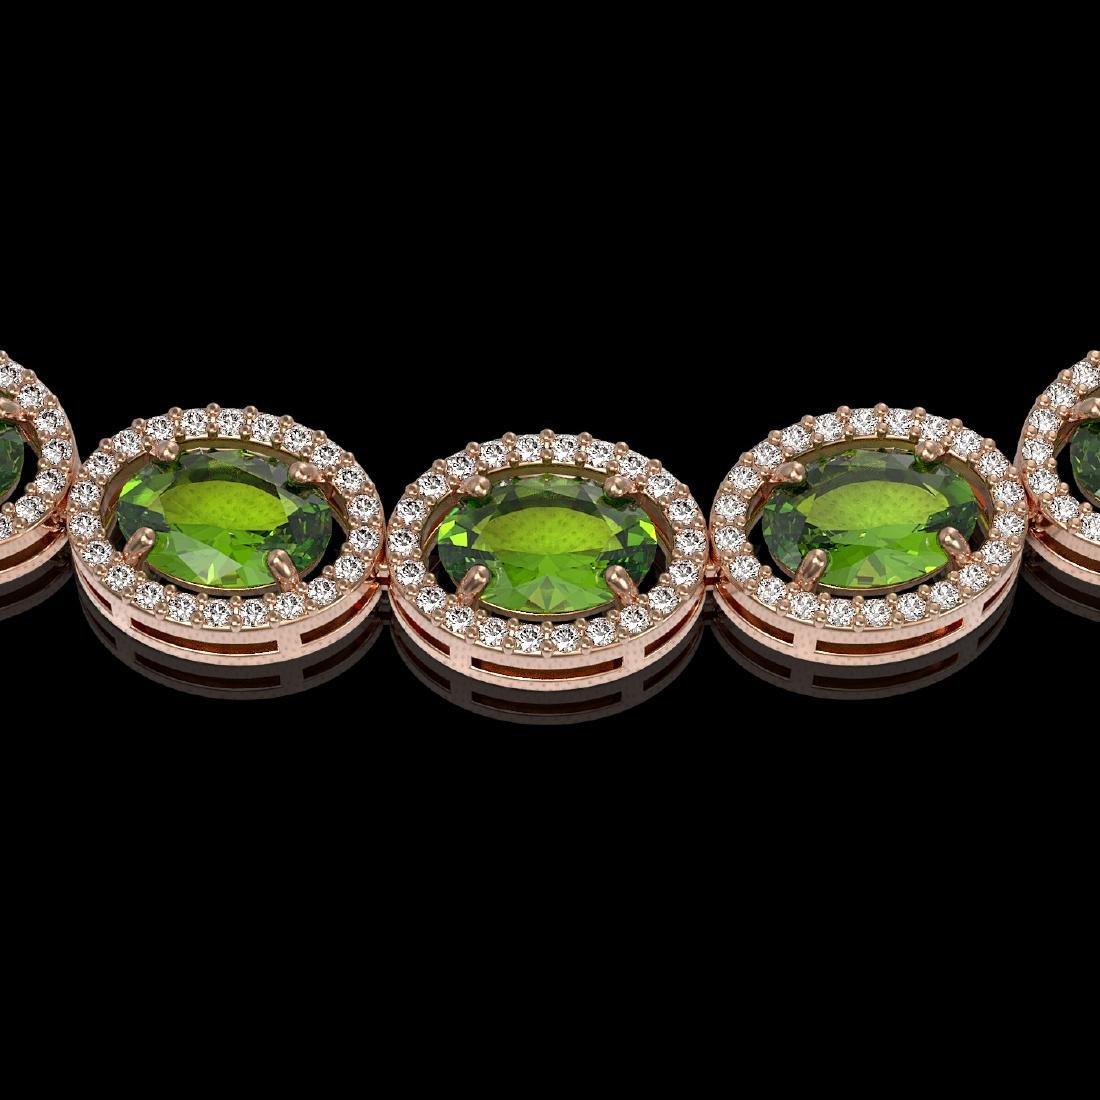 48.14 CTW Peridot & Diamond Halo Necklace 10K Rose Gold - 2